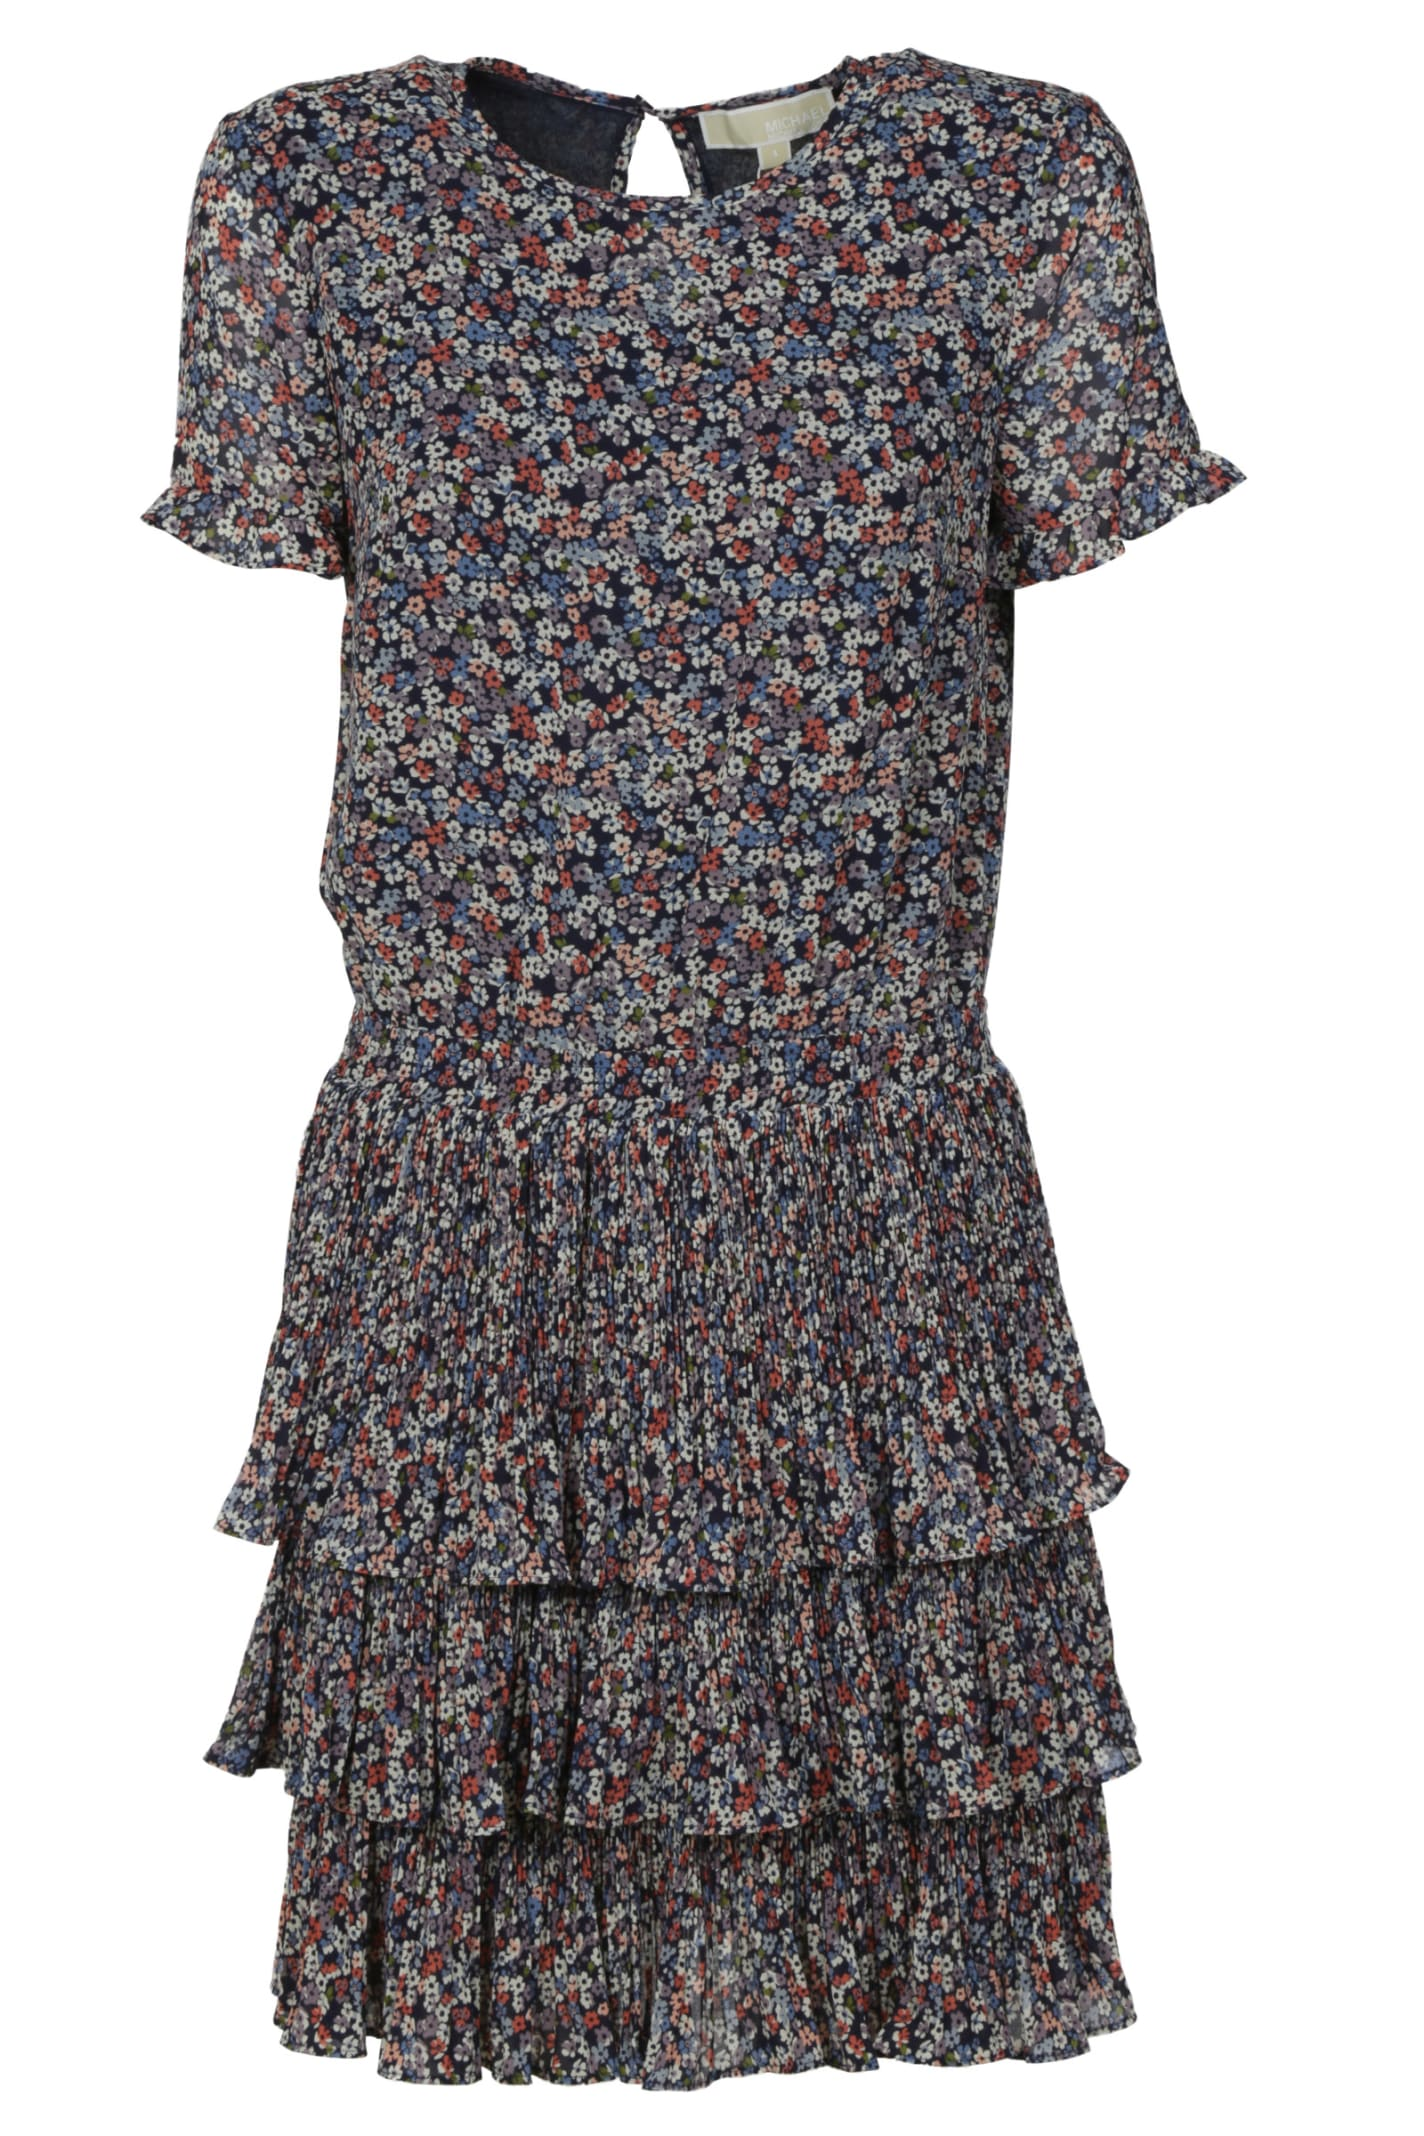 Michael Kors Floral All-over Dress